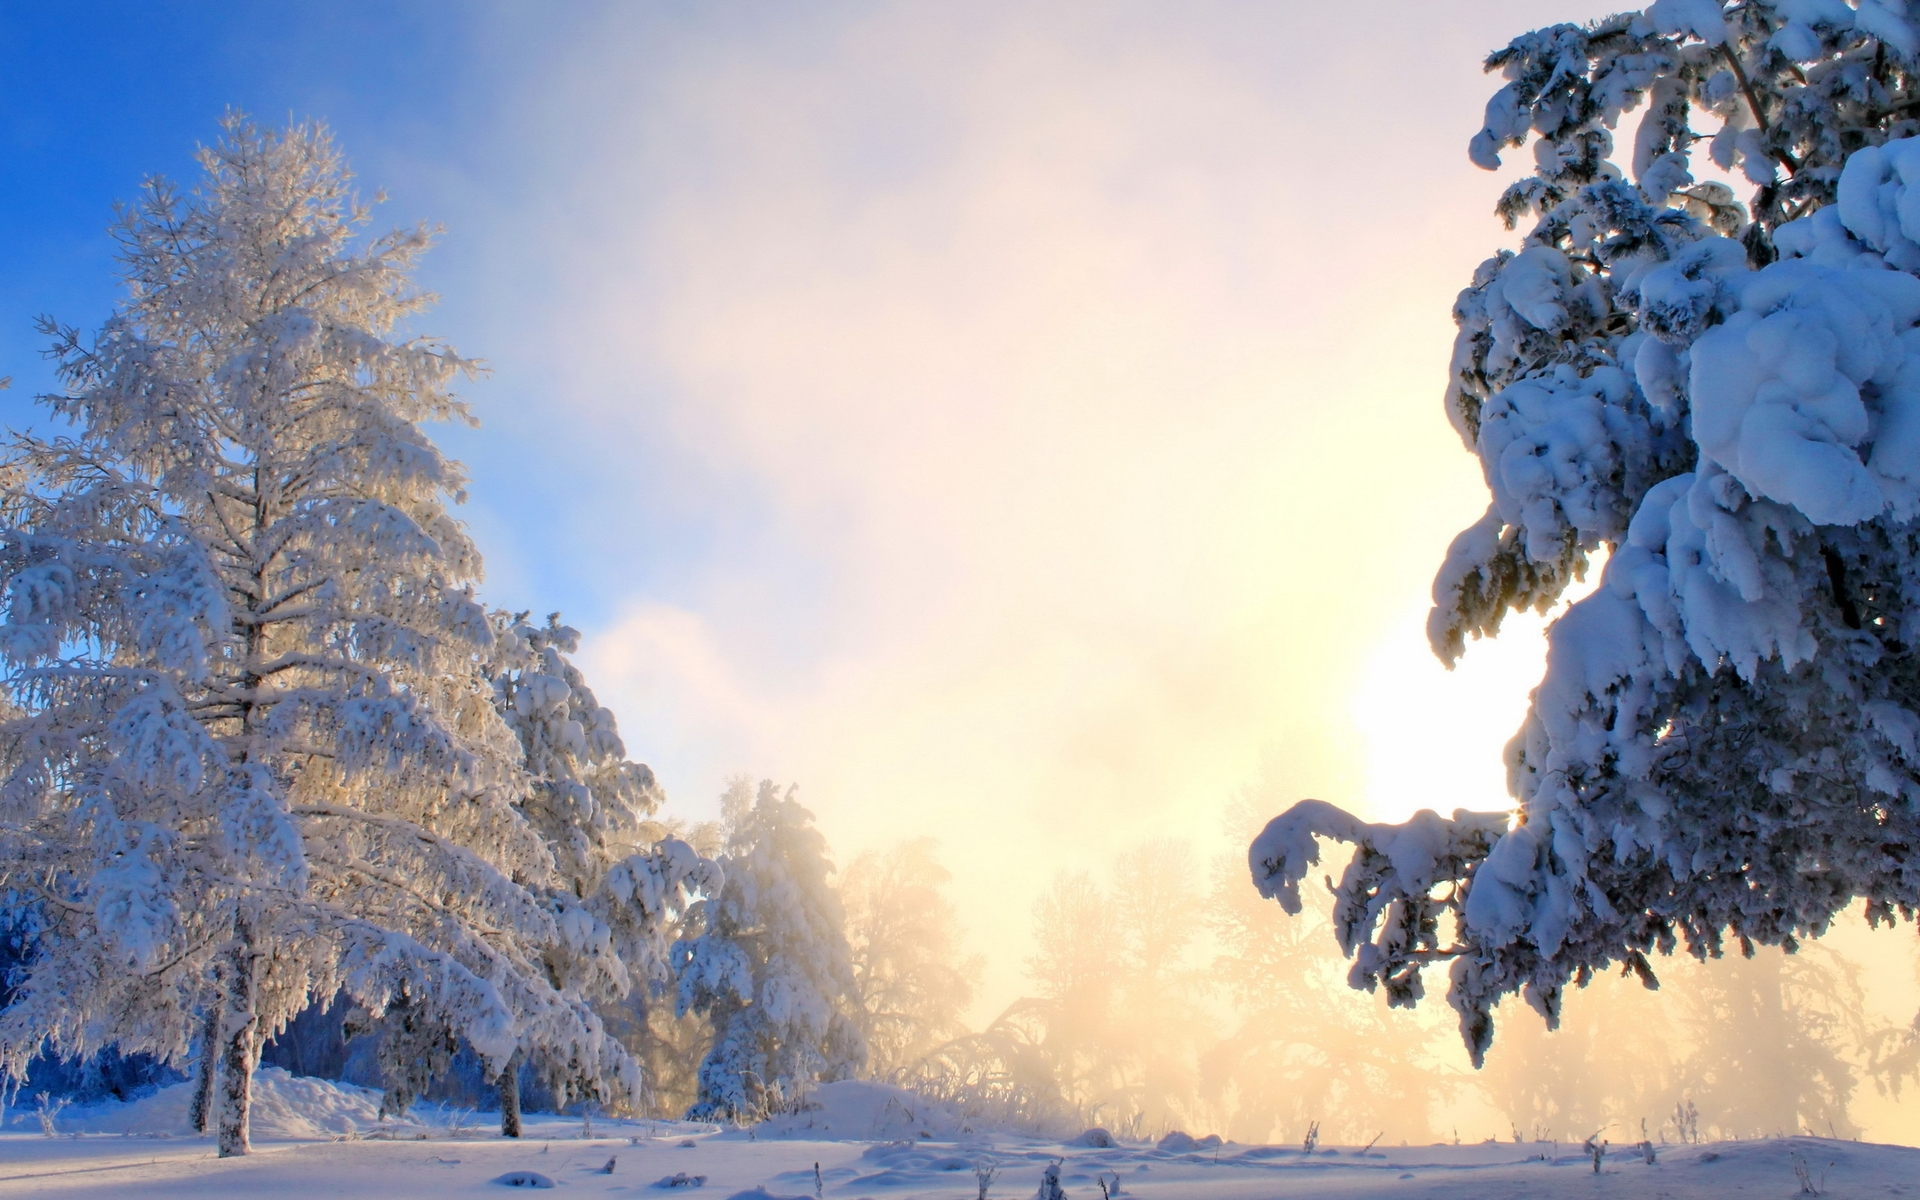 Download Snowy pine trees wallpaper 1920x1200